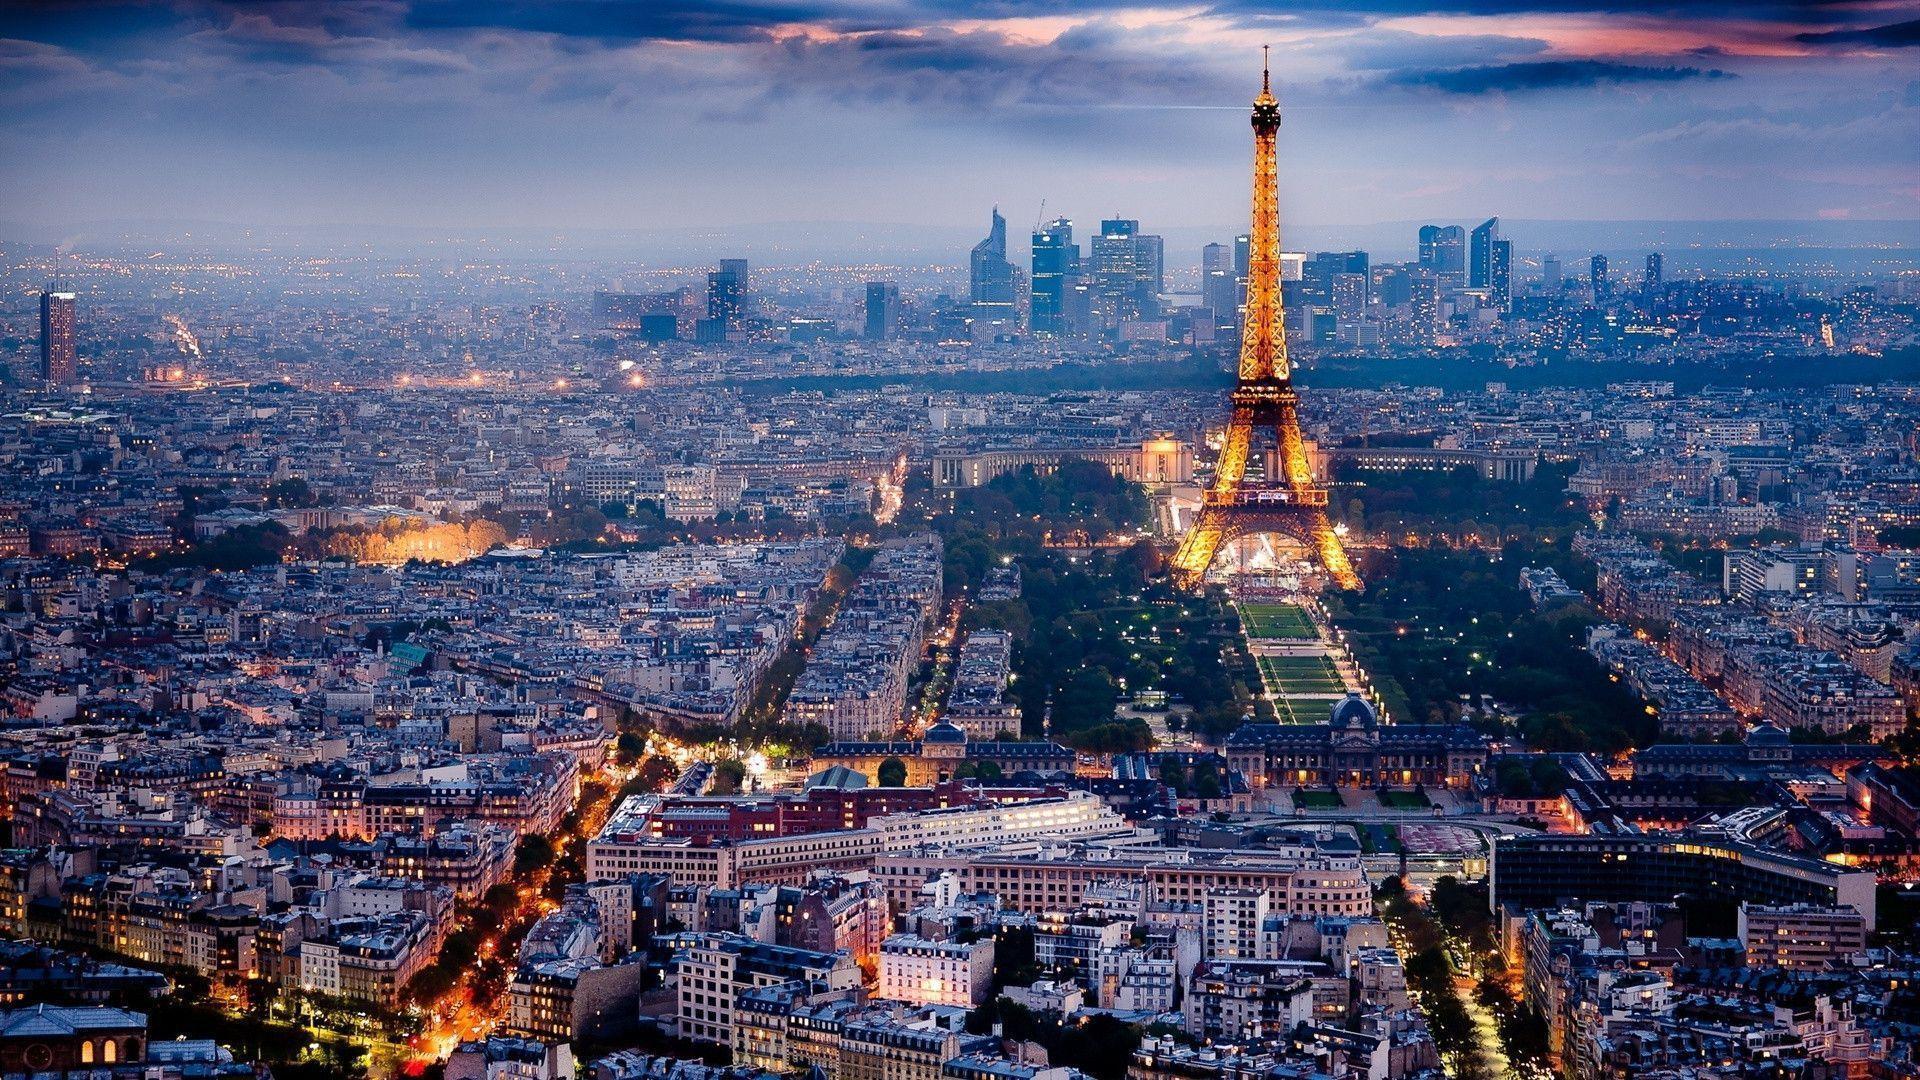 Desktop HD wallpaper: Paris Night Desktop Wallpapers